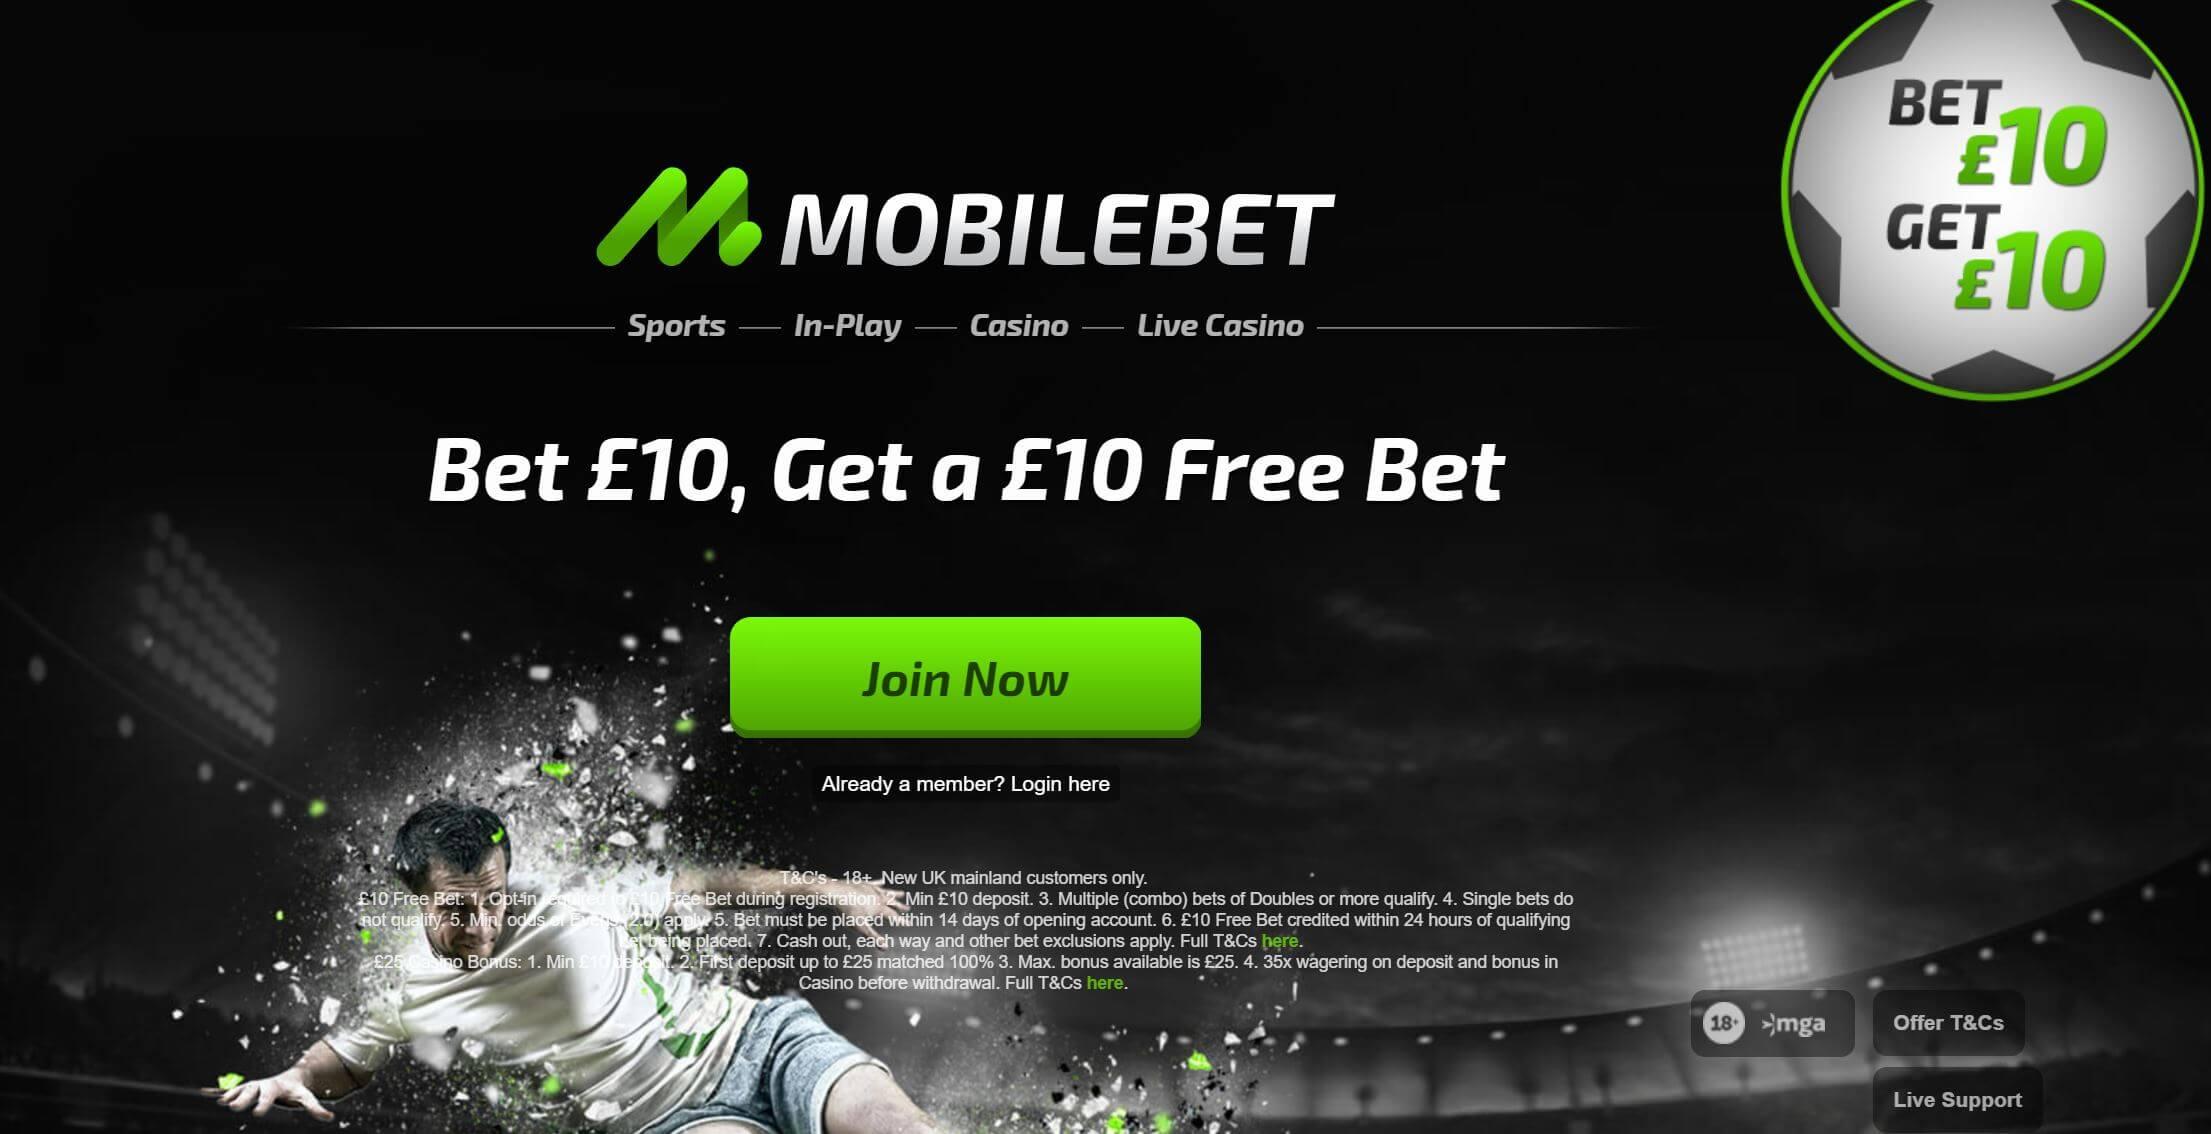 Mobilebet sports bonus